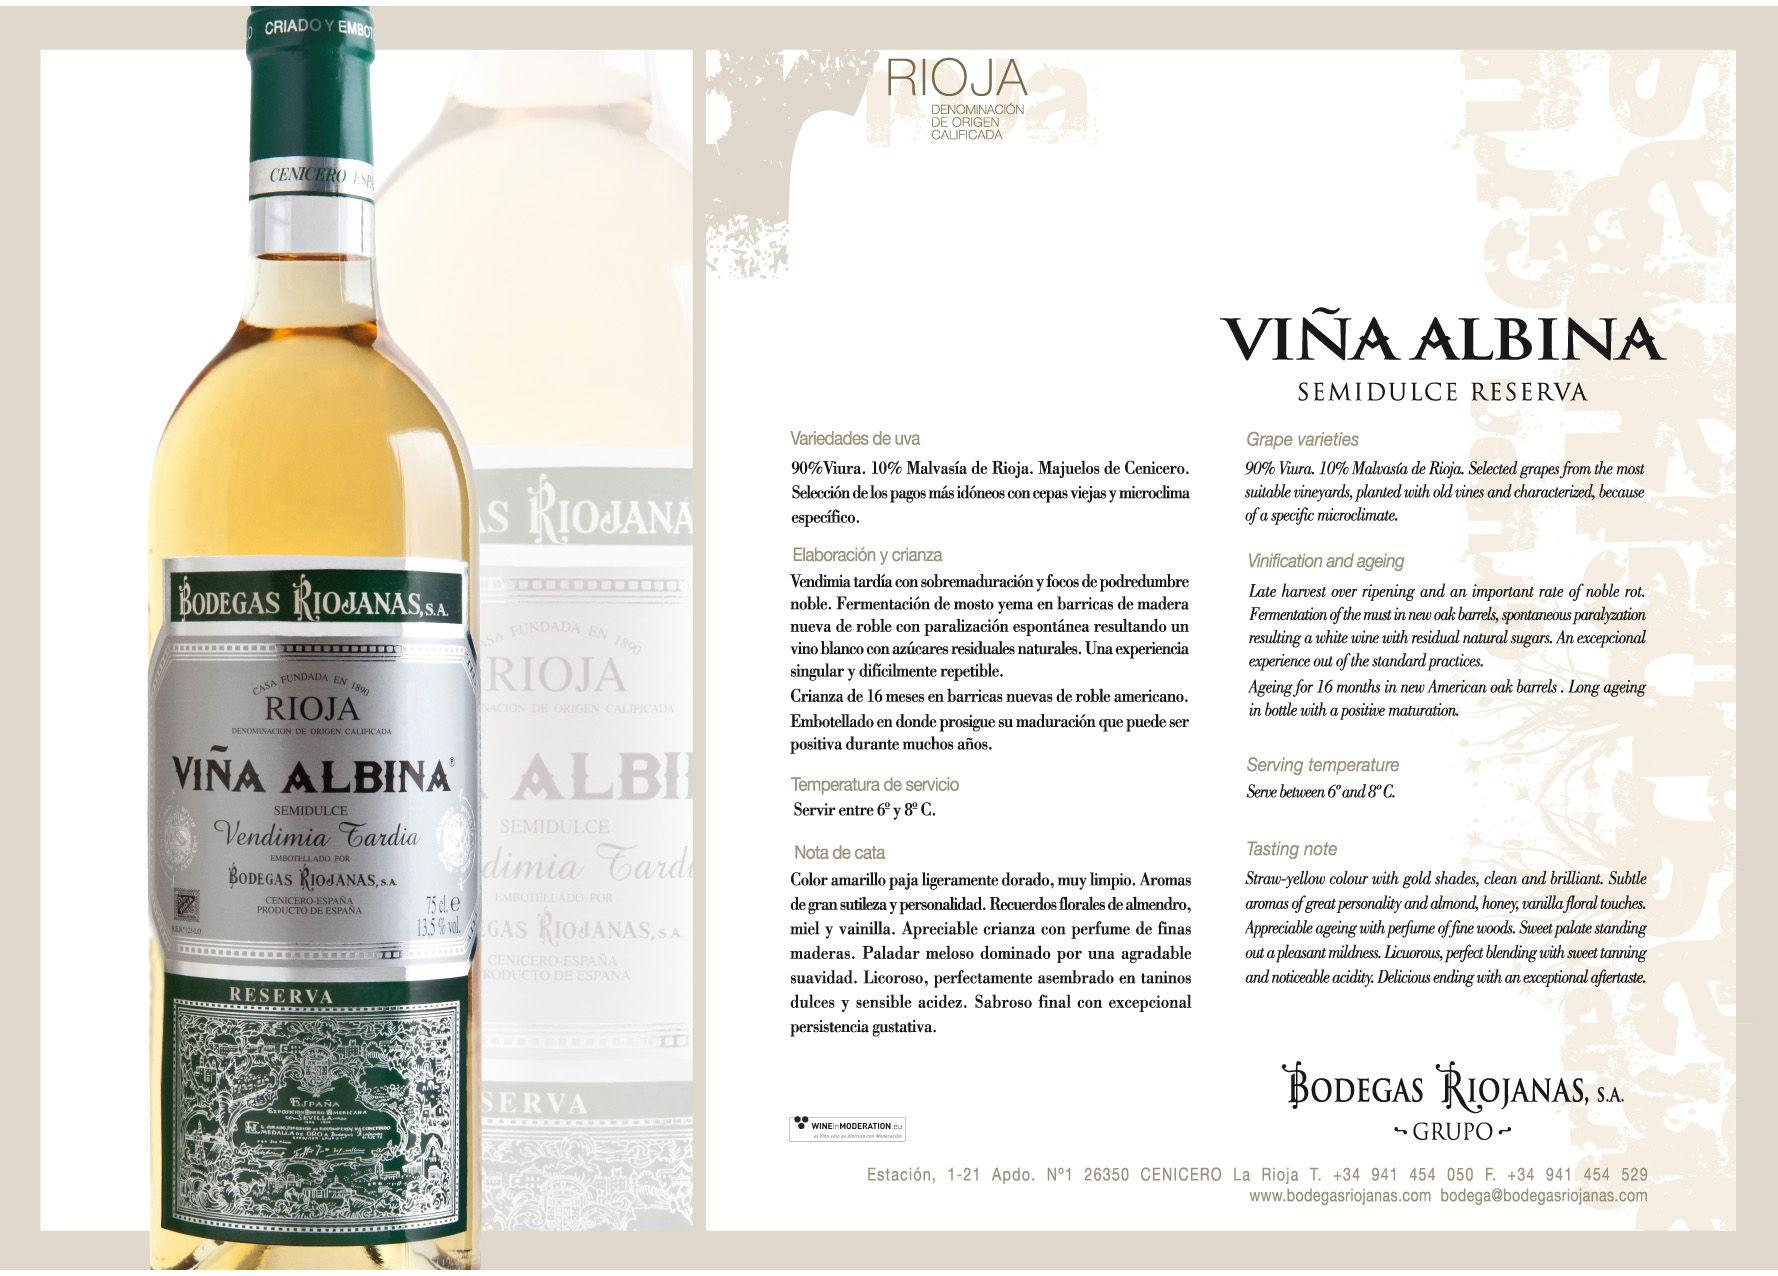 Vina Albina Blanco Semidulce Reserva Vinaalbina Wine